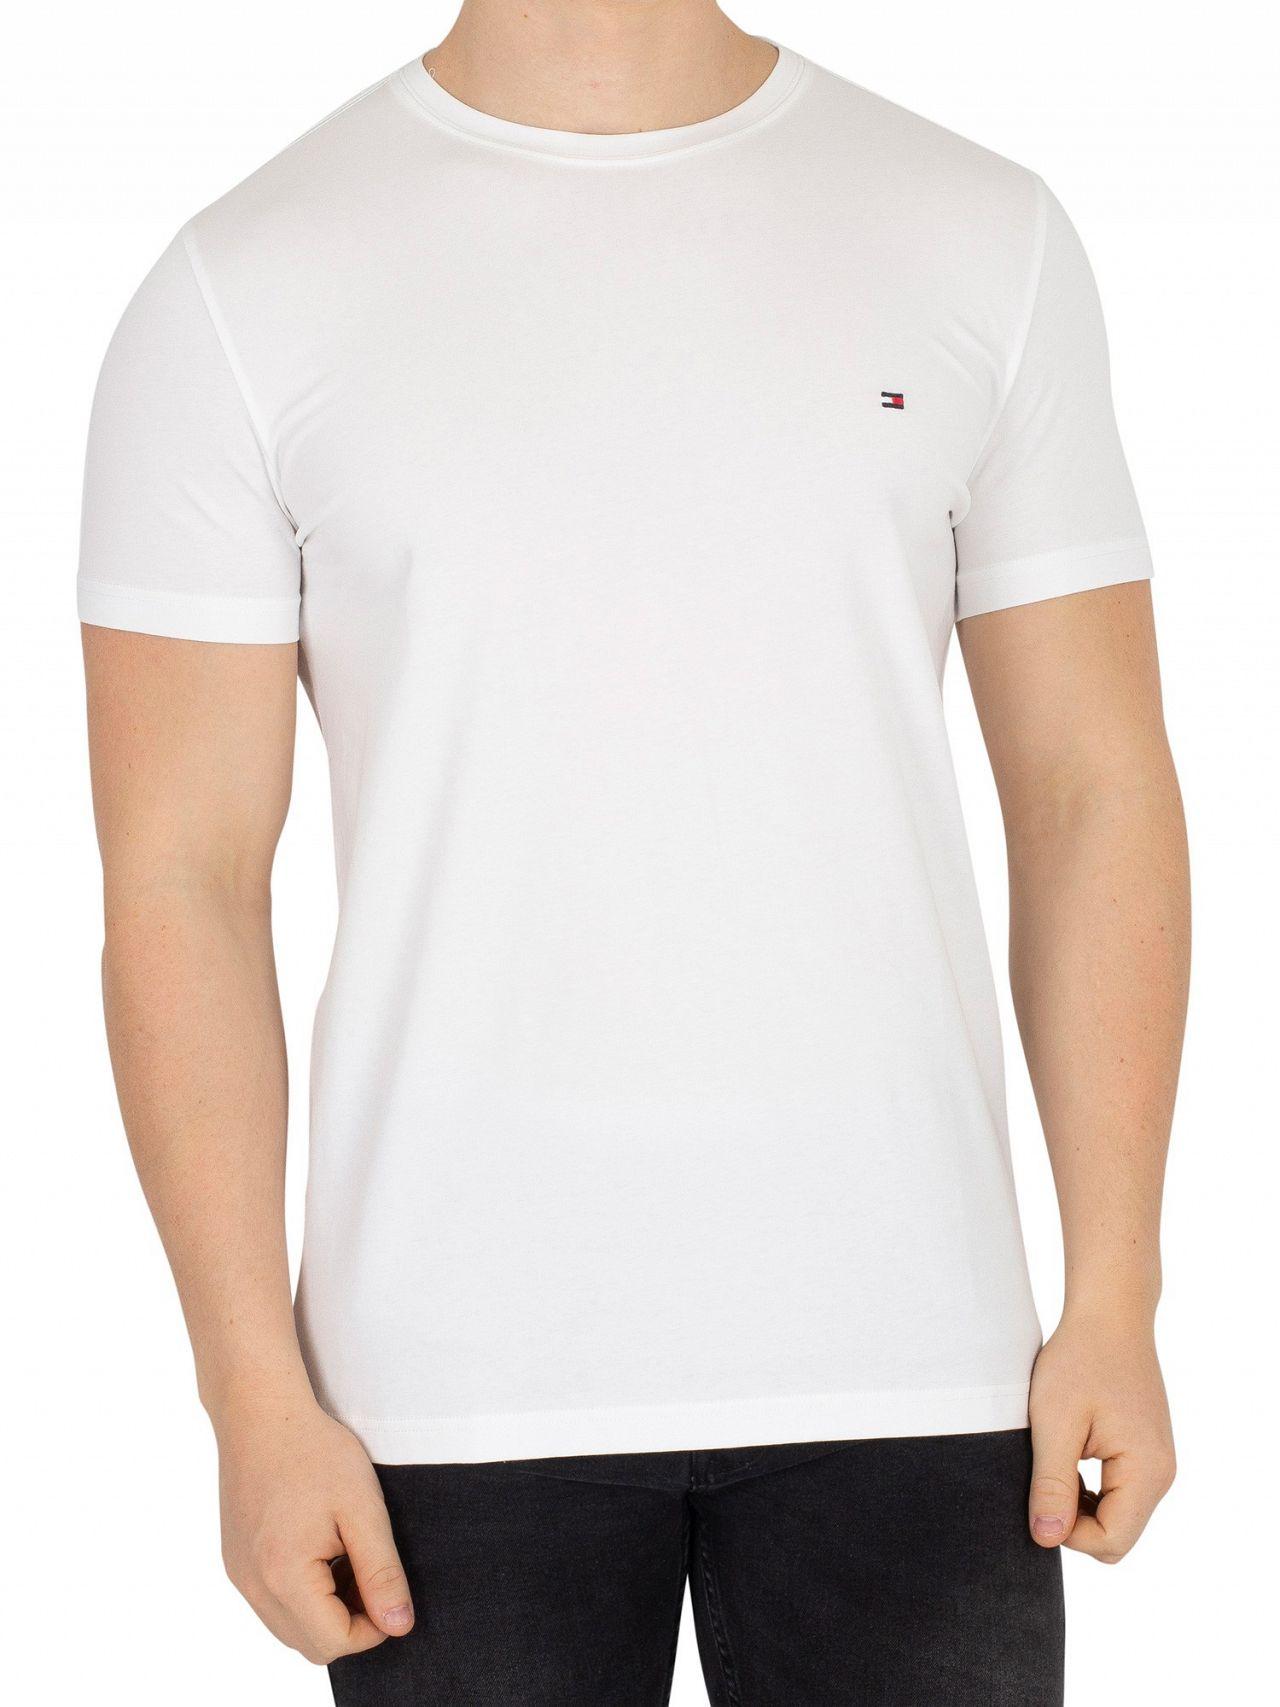 12a5354e Tommy Hilfiger Classic White Slim Fit Stretch Logo T-Shirt | Standout